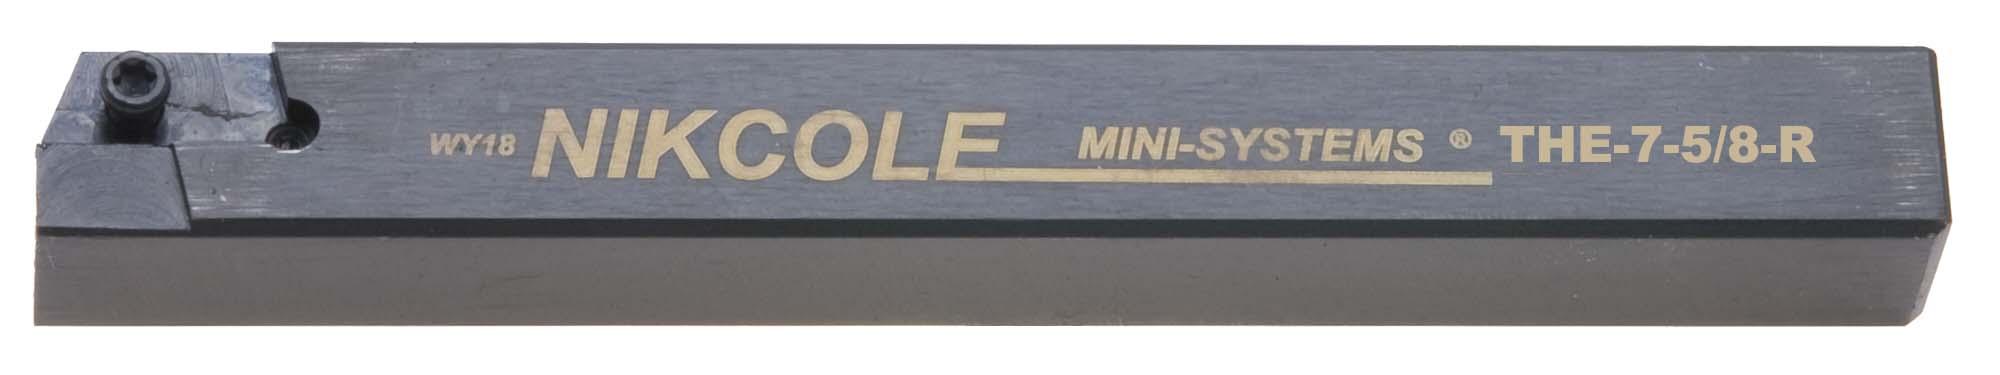 "Nikcole .625"" Sq. RH Mini-System Tool Holder"